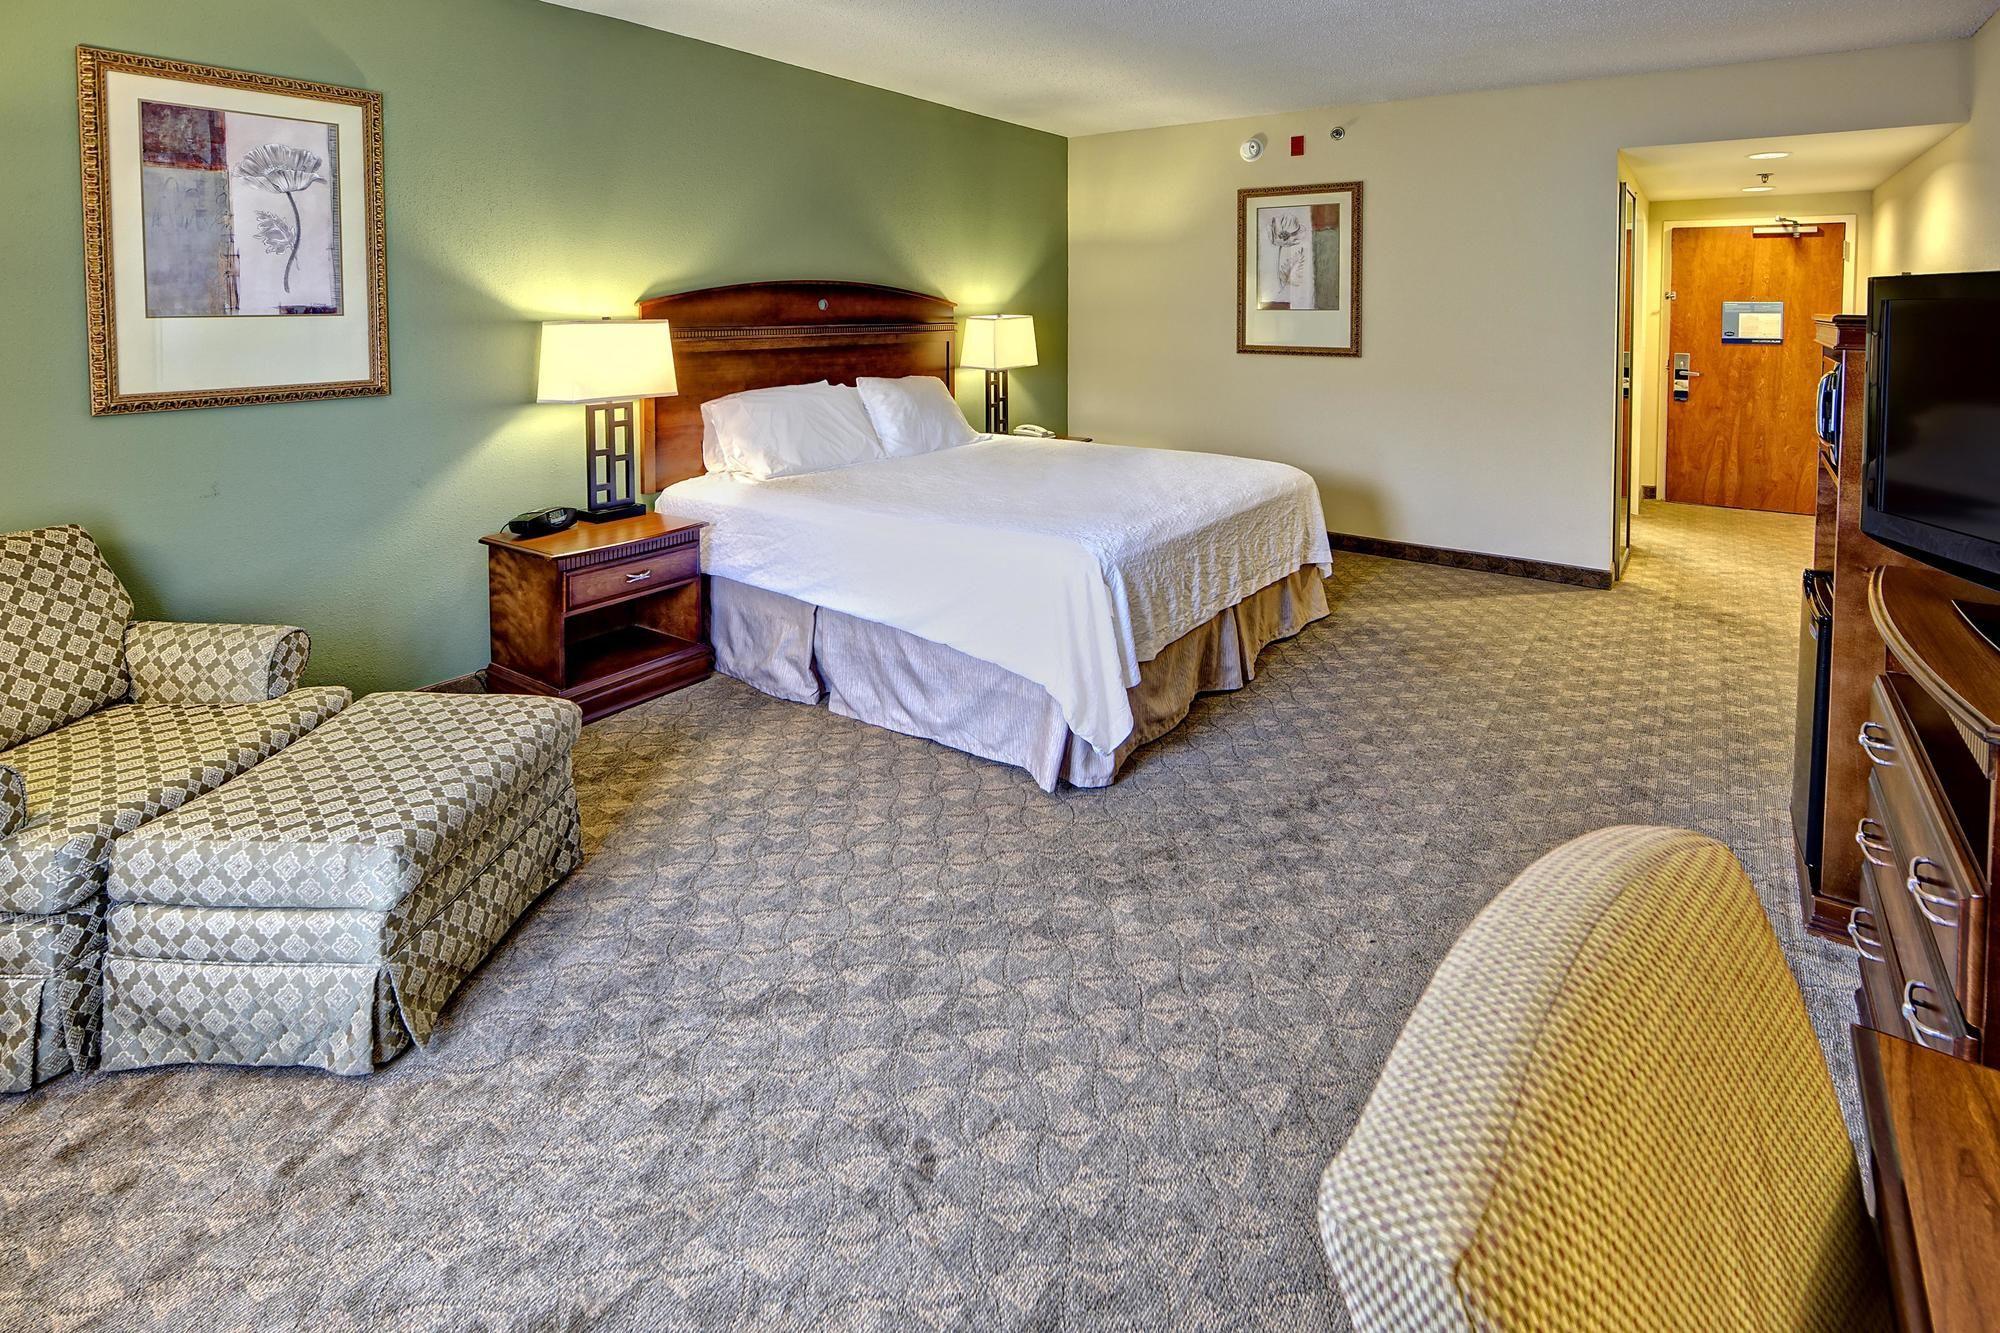 Hampton Inn & Suites Cashiers Sapphire Valley in Sapphire, NC